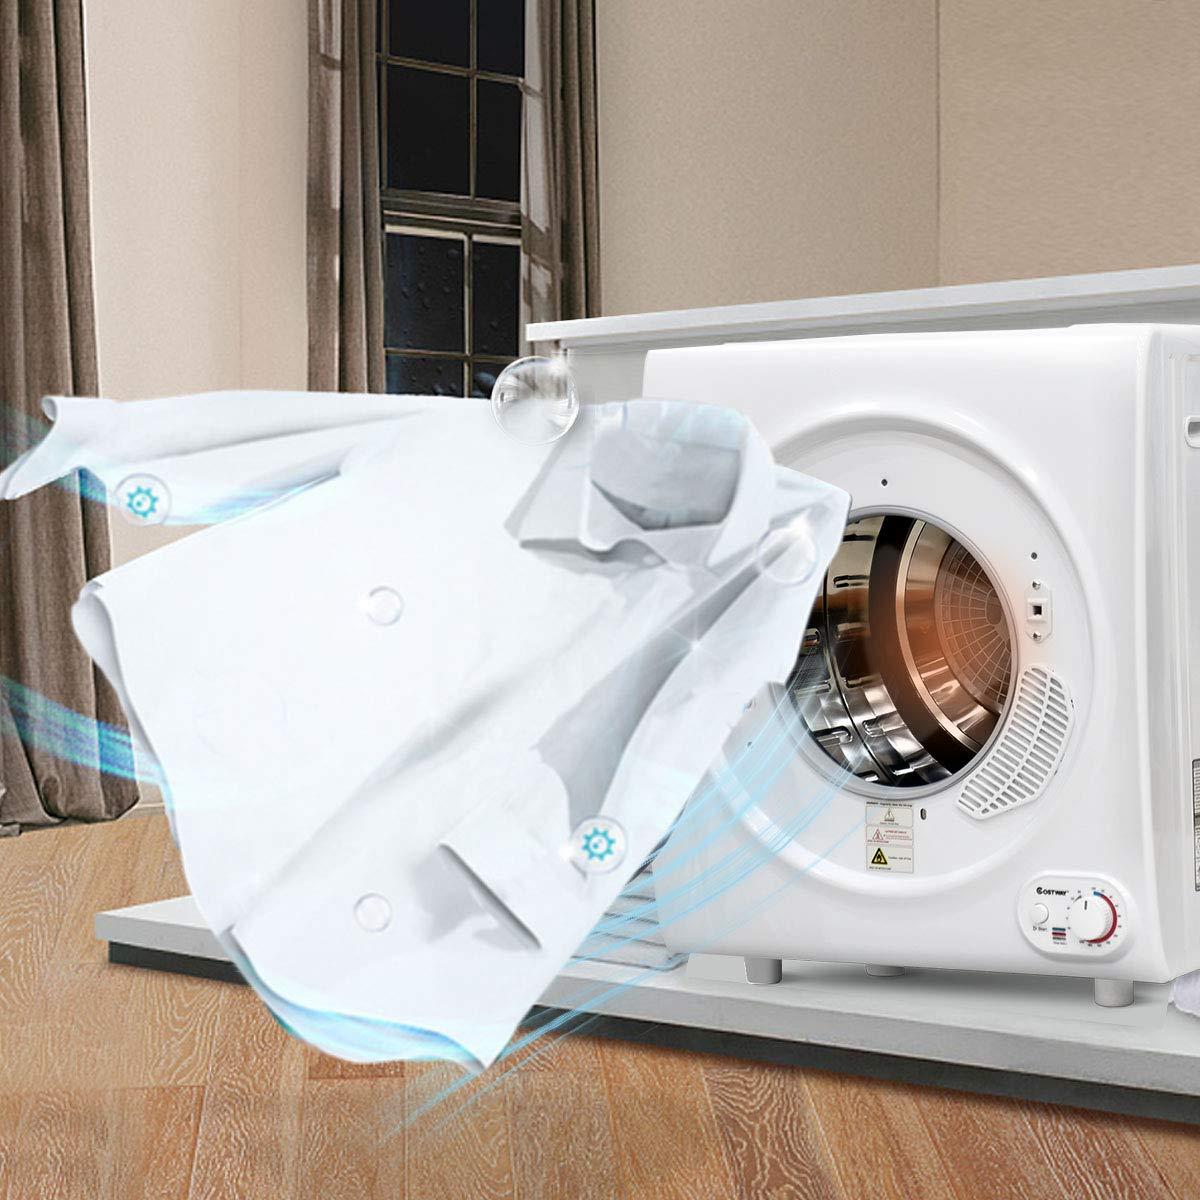 costway secado ablufttrockner Secadora wärmepumpentrockner/4 kg/75 ...